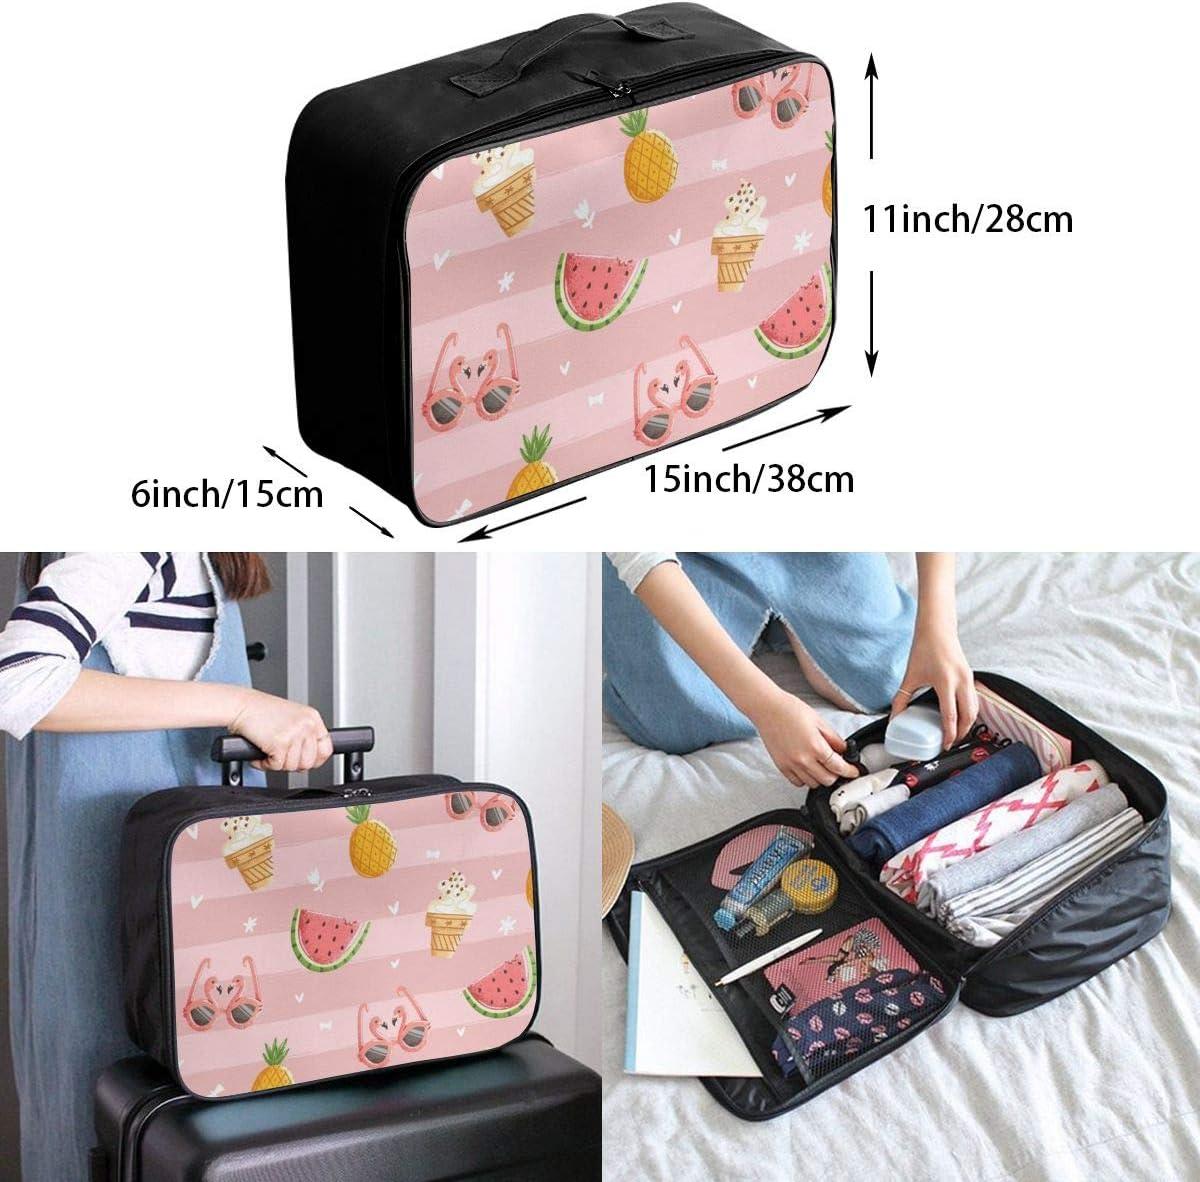 Yunshm Pink Summer Flamingo Personalized Trolley Handbag Waterproof Unisex Large Capacity For Business Travel Storage